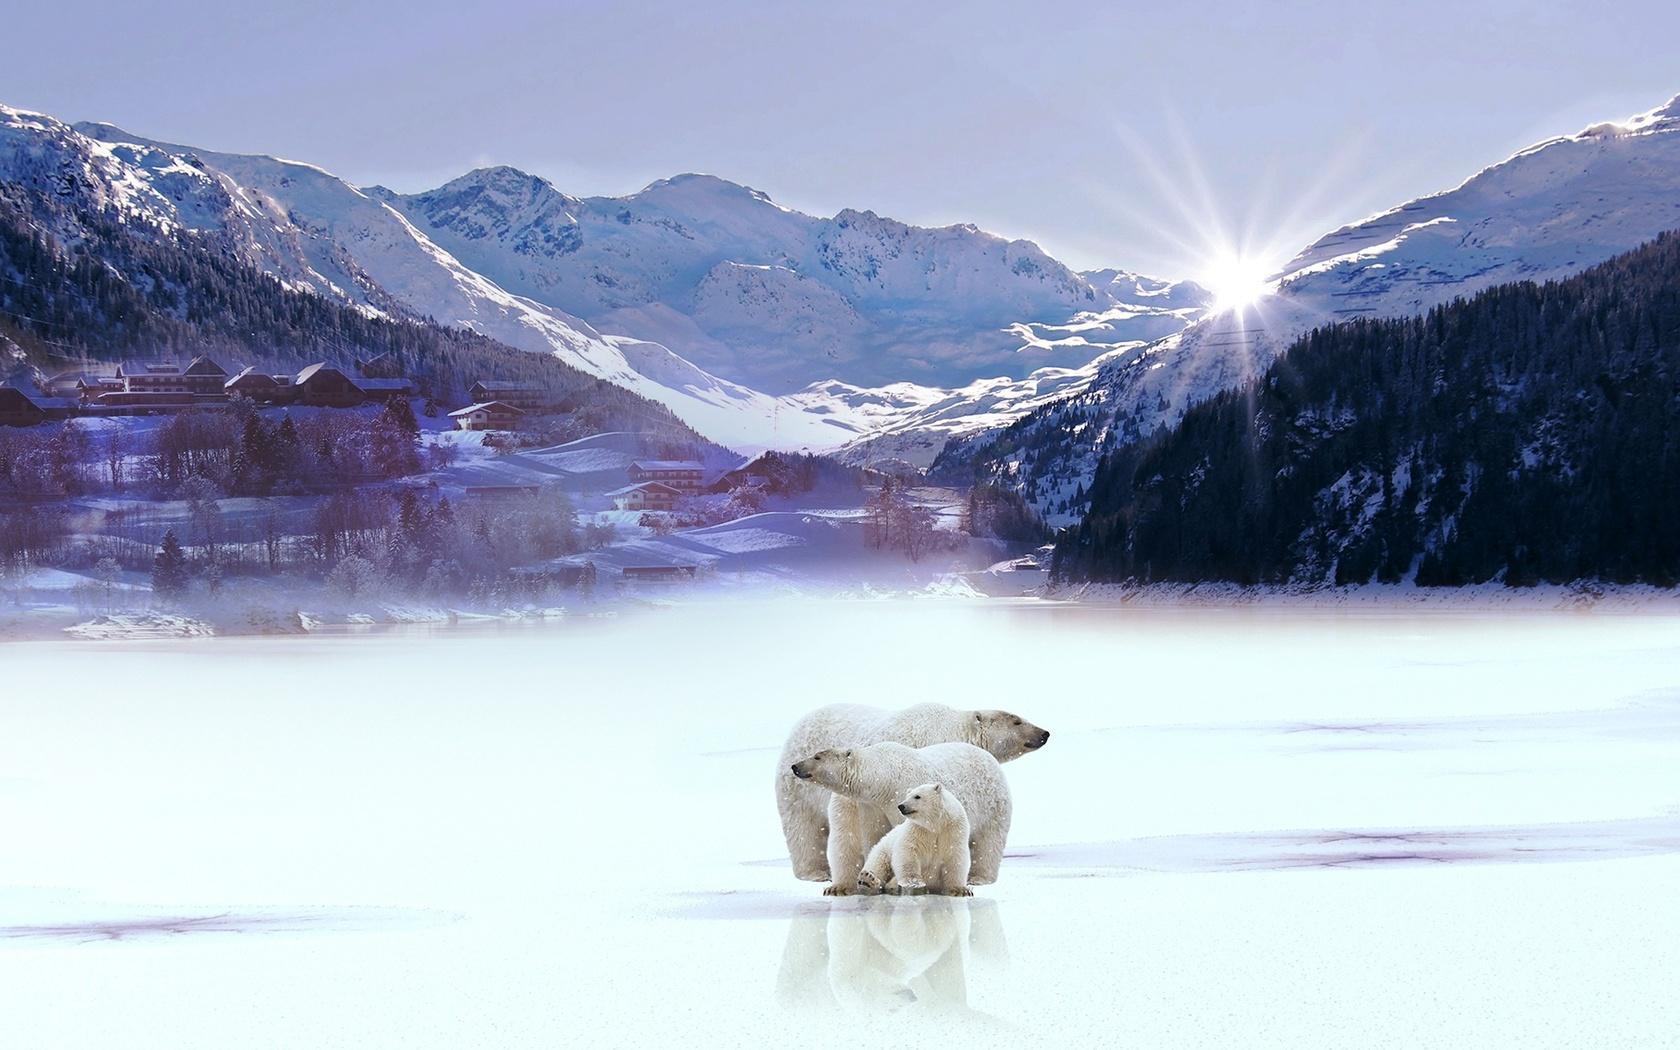 медведи, лед, озеро, горы